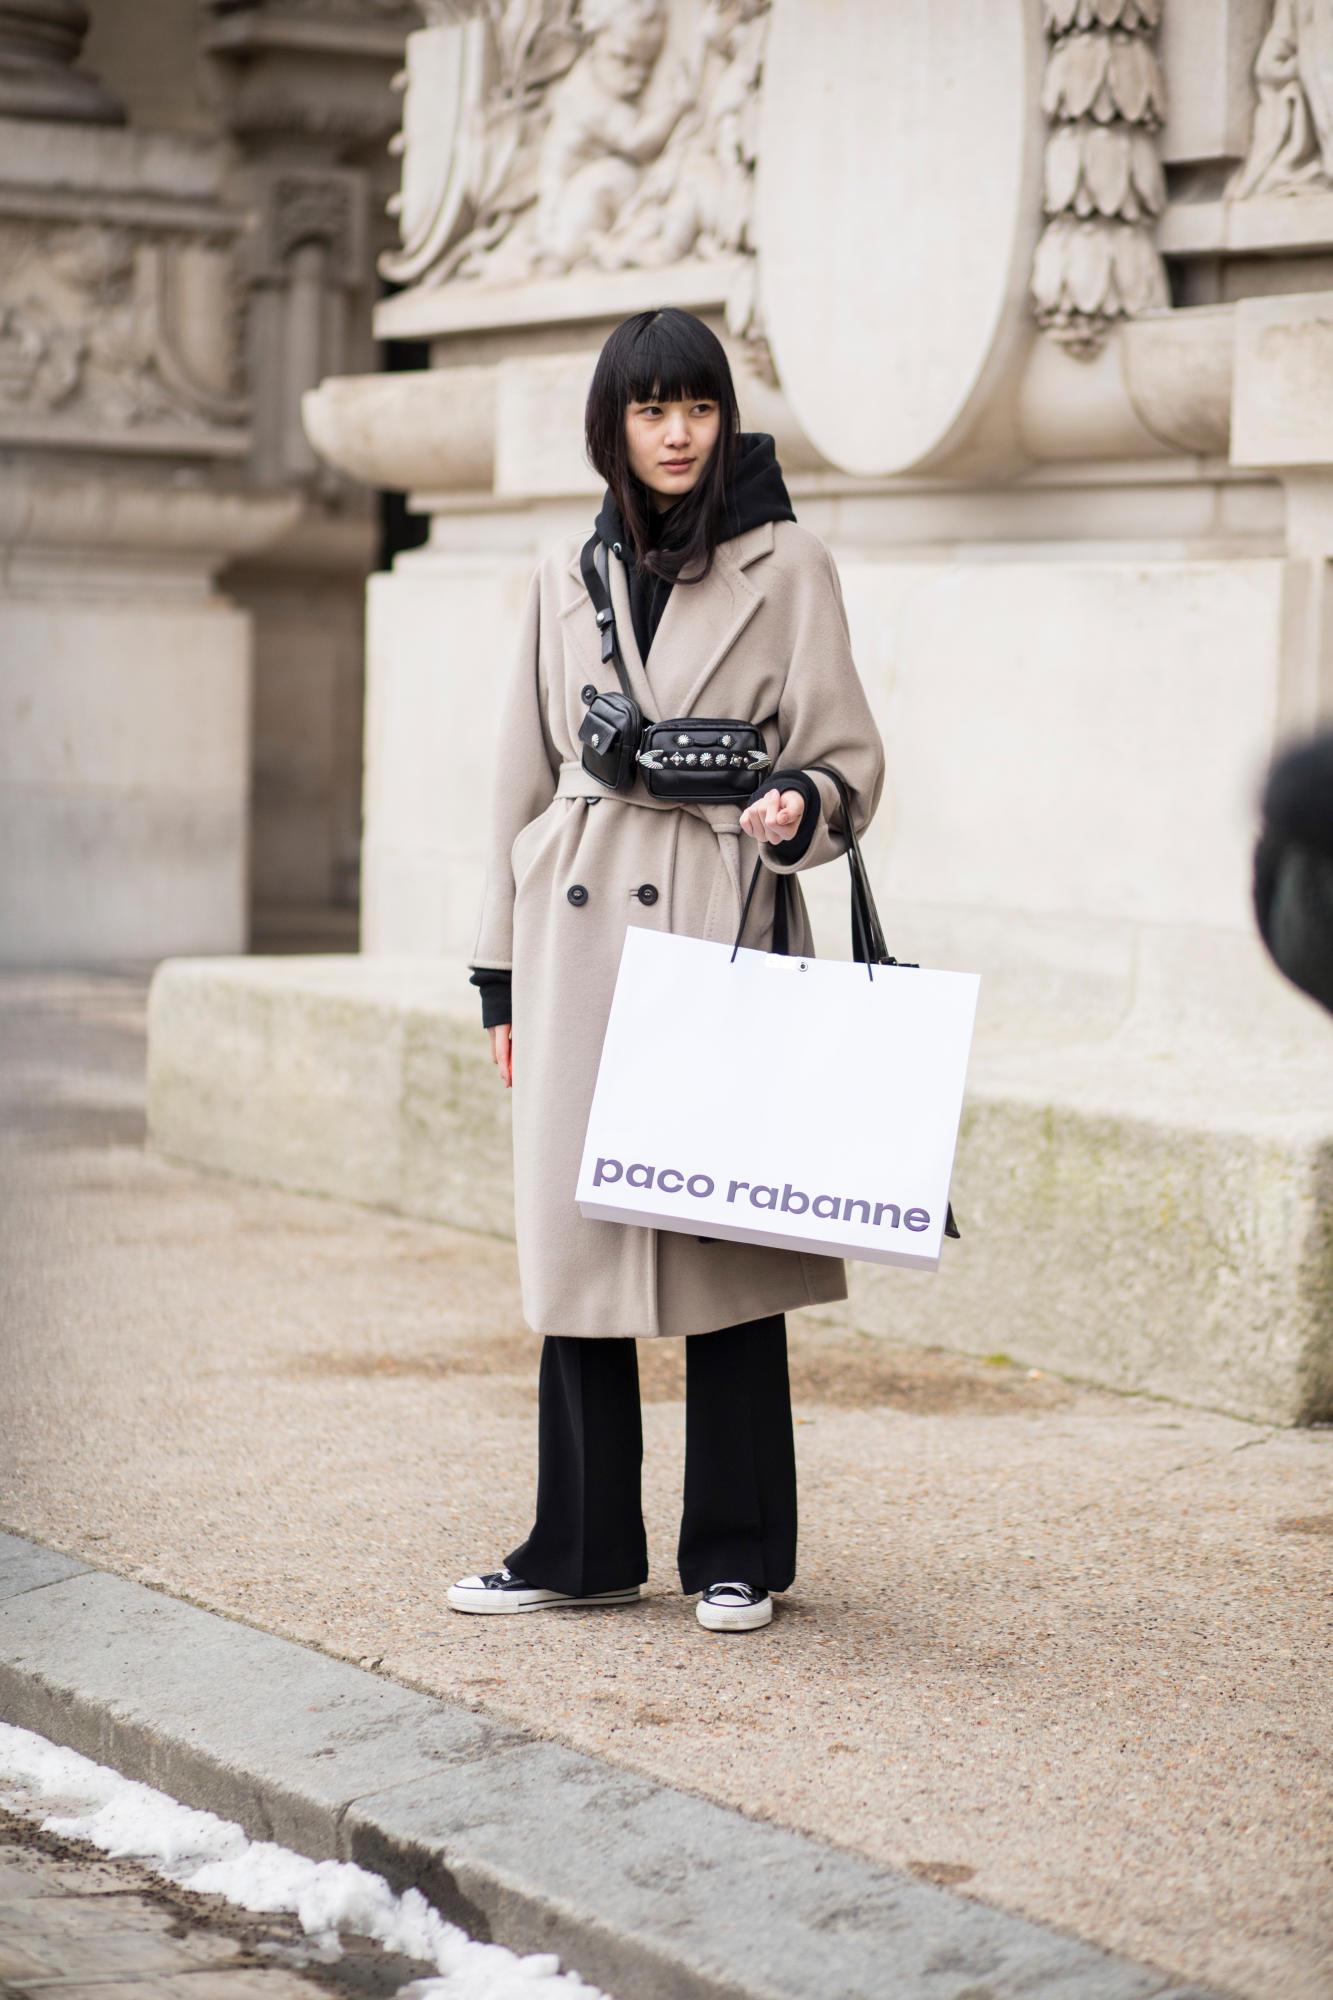 paris-fashion-week-street-style-fall-2018-day-3-7.jpg